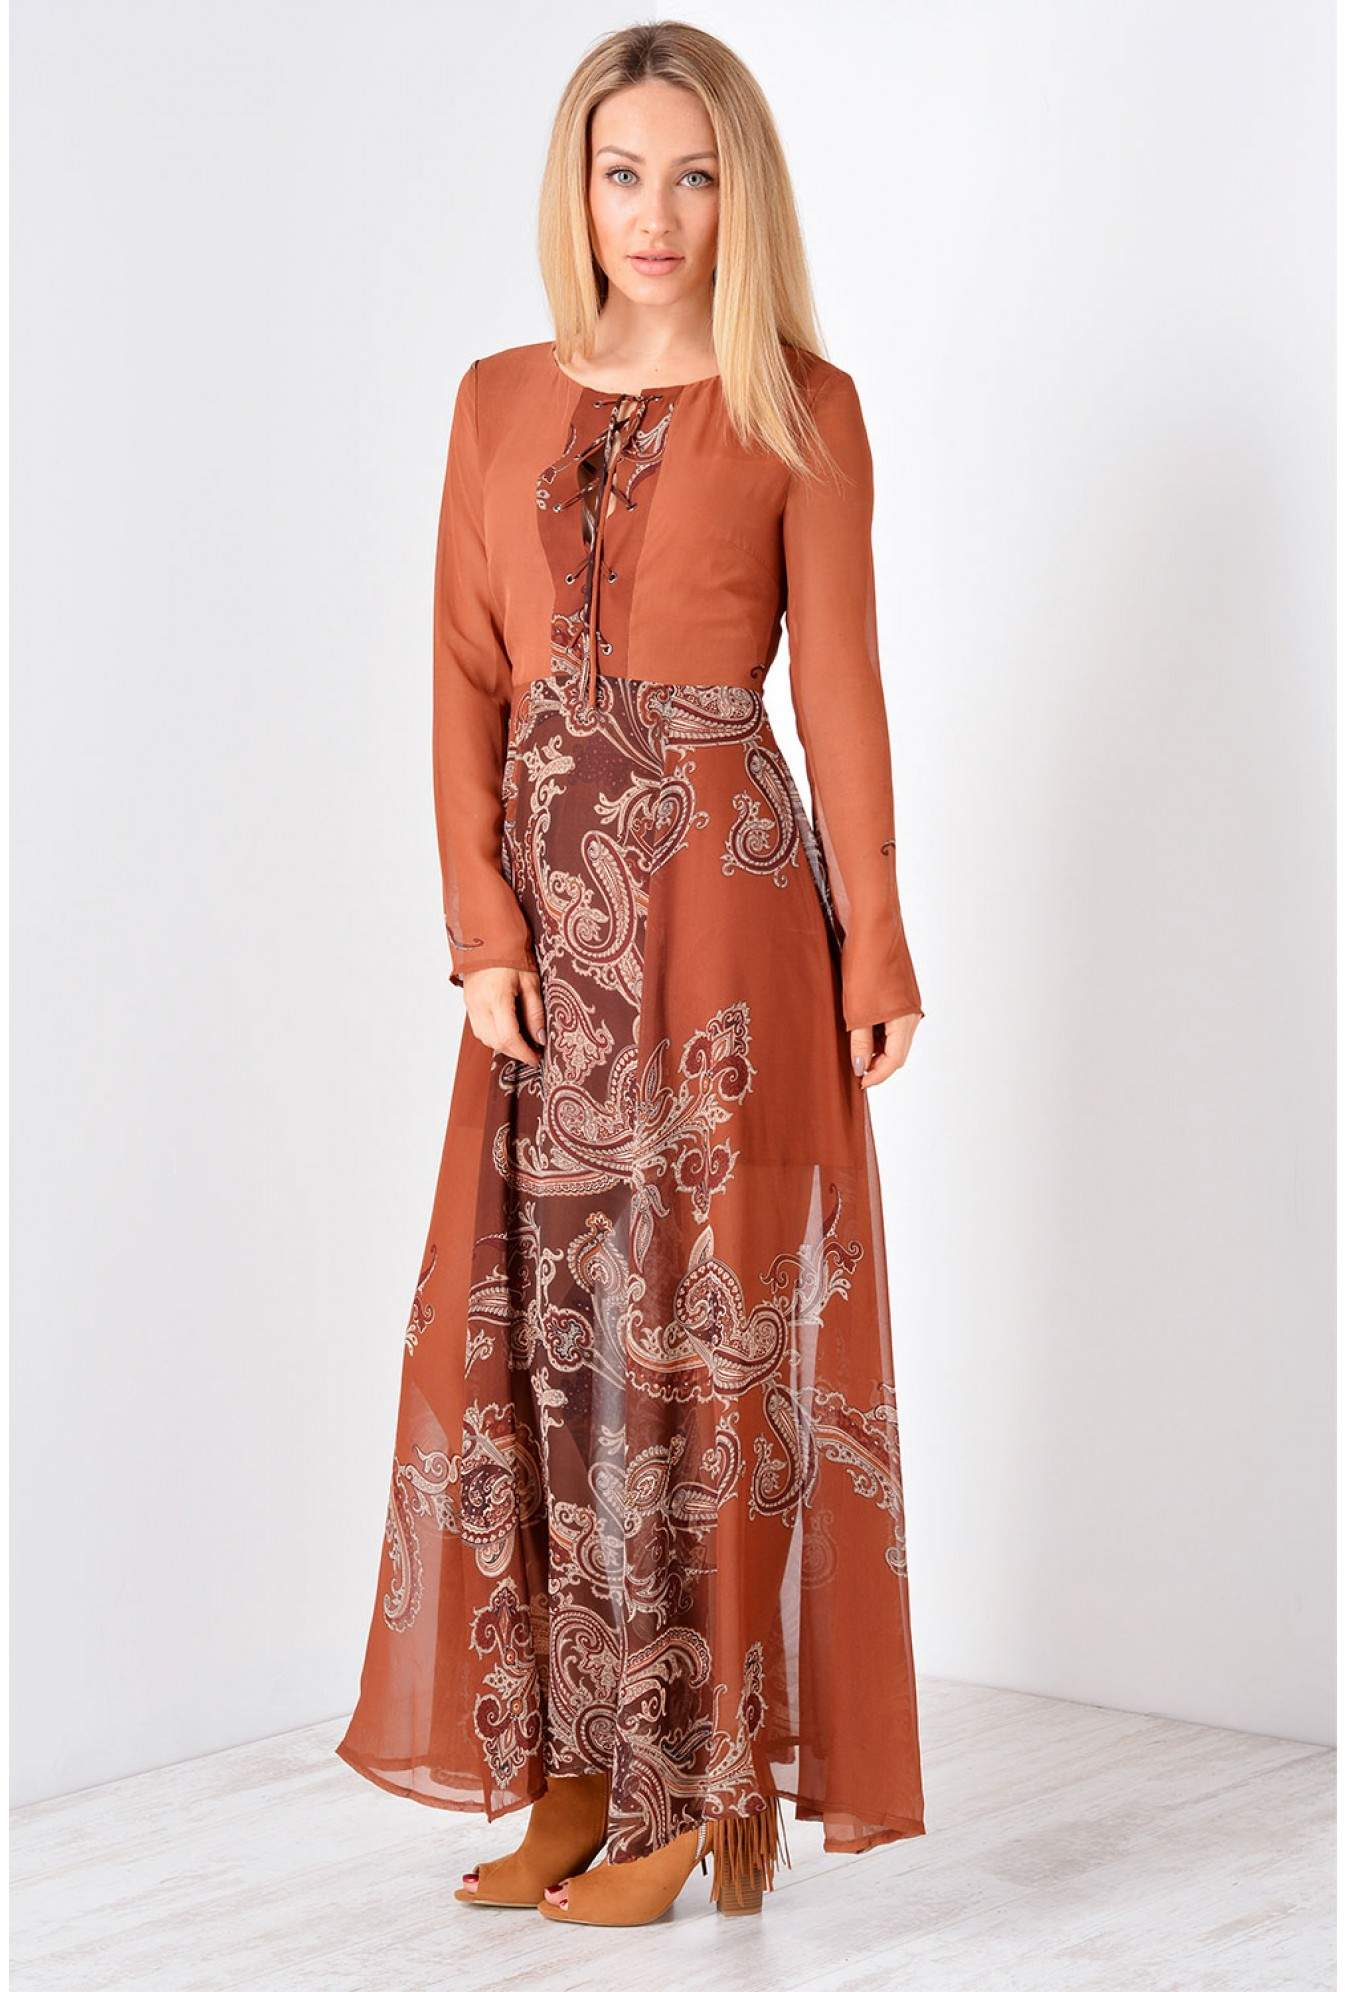 80b2e478a1 More Views. Brigid Paisley Print Maxi Dress in Rust